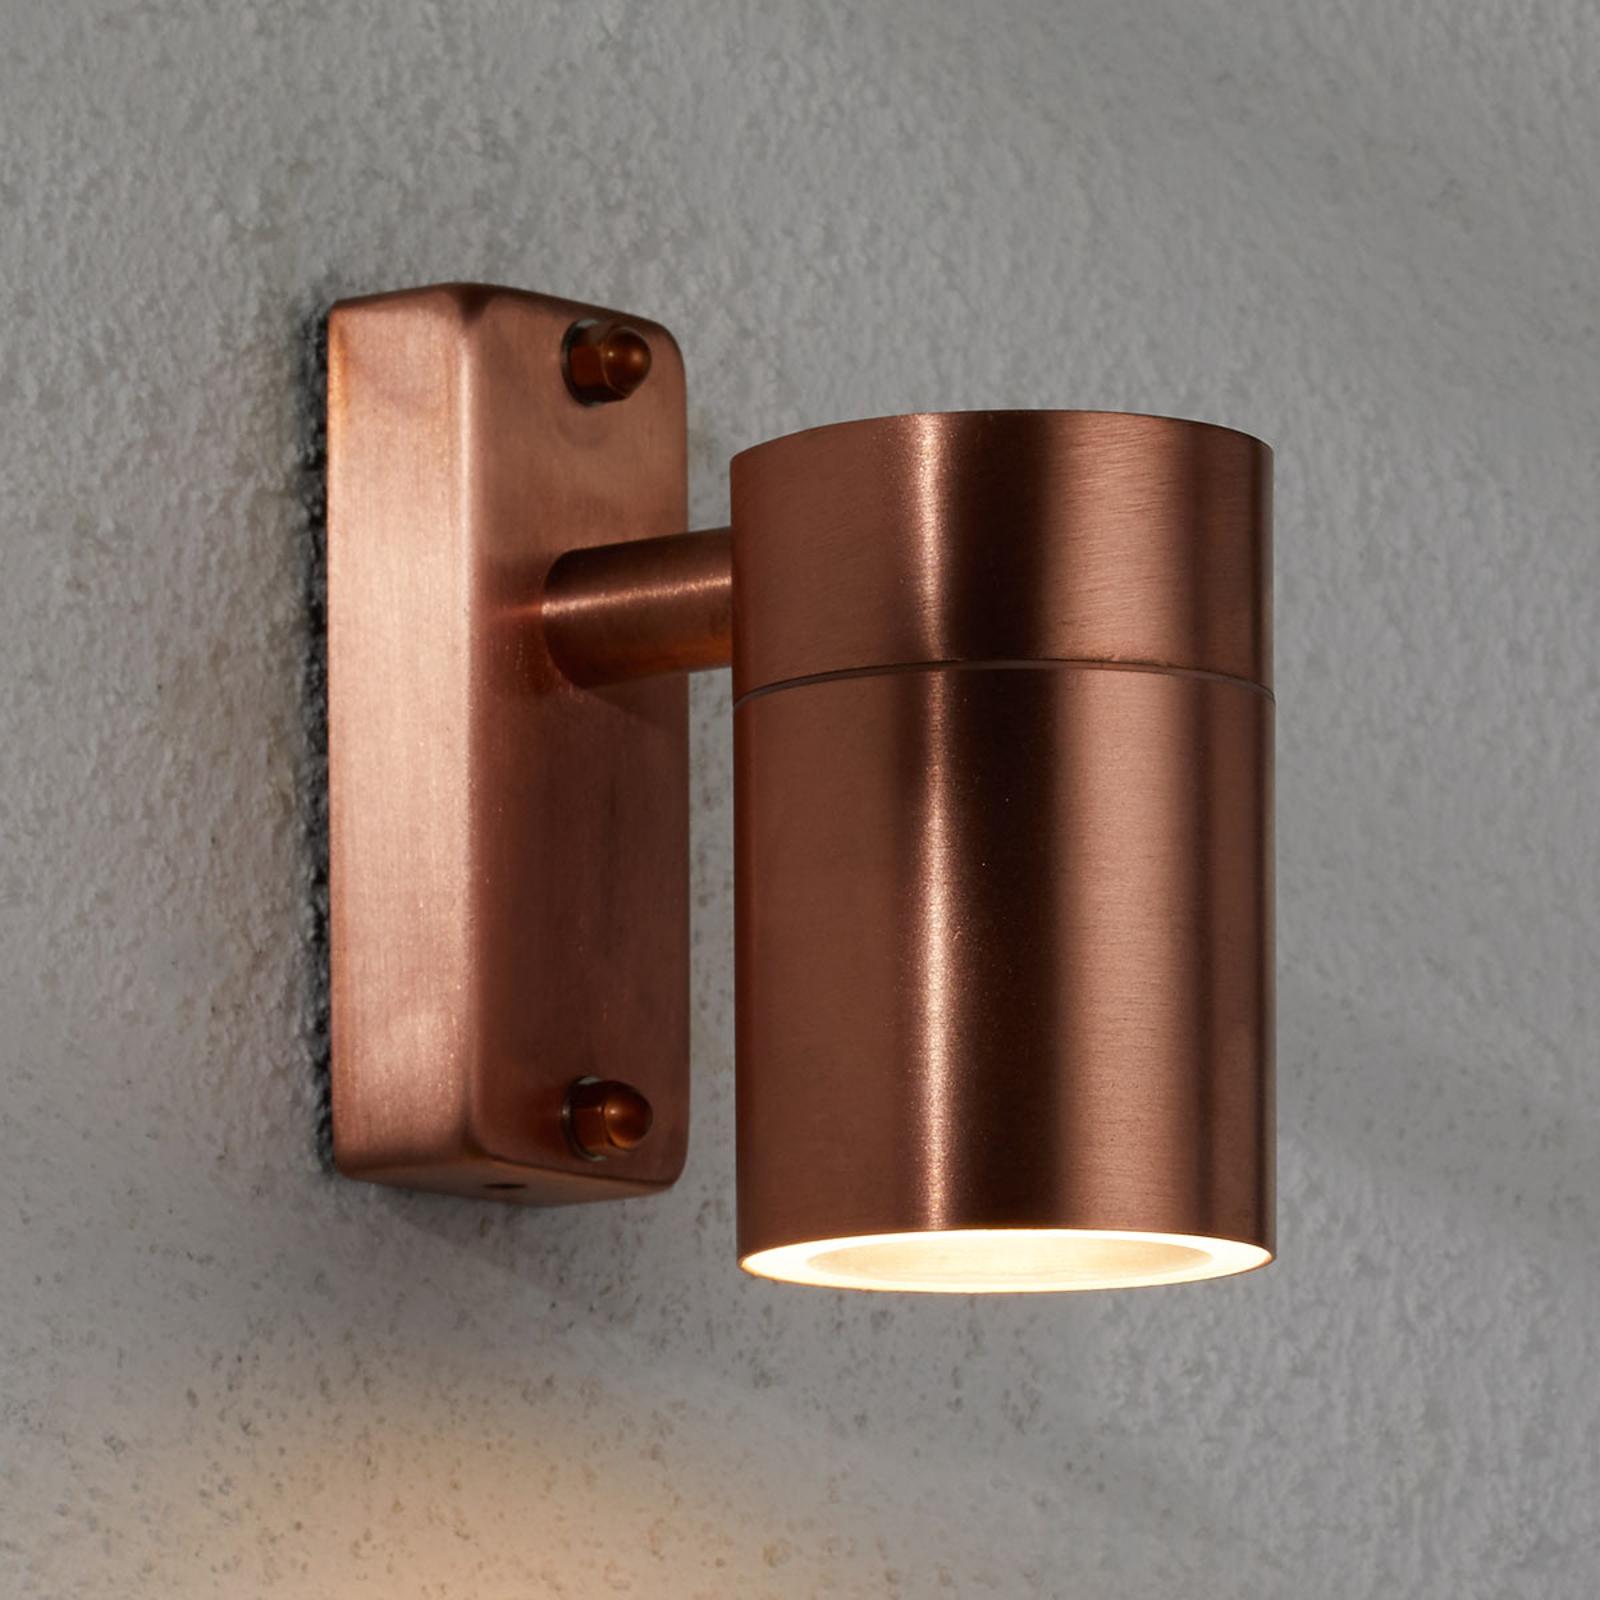 Koperkleurige wandlamp TIN